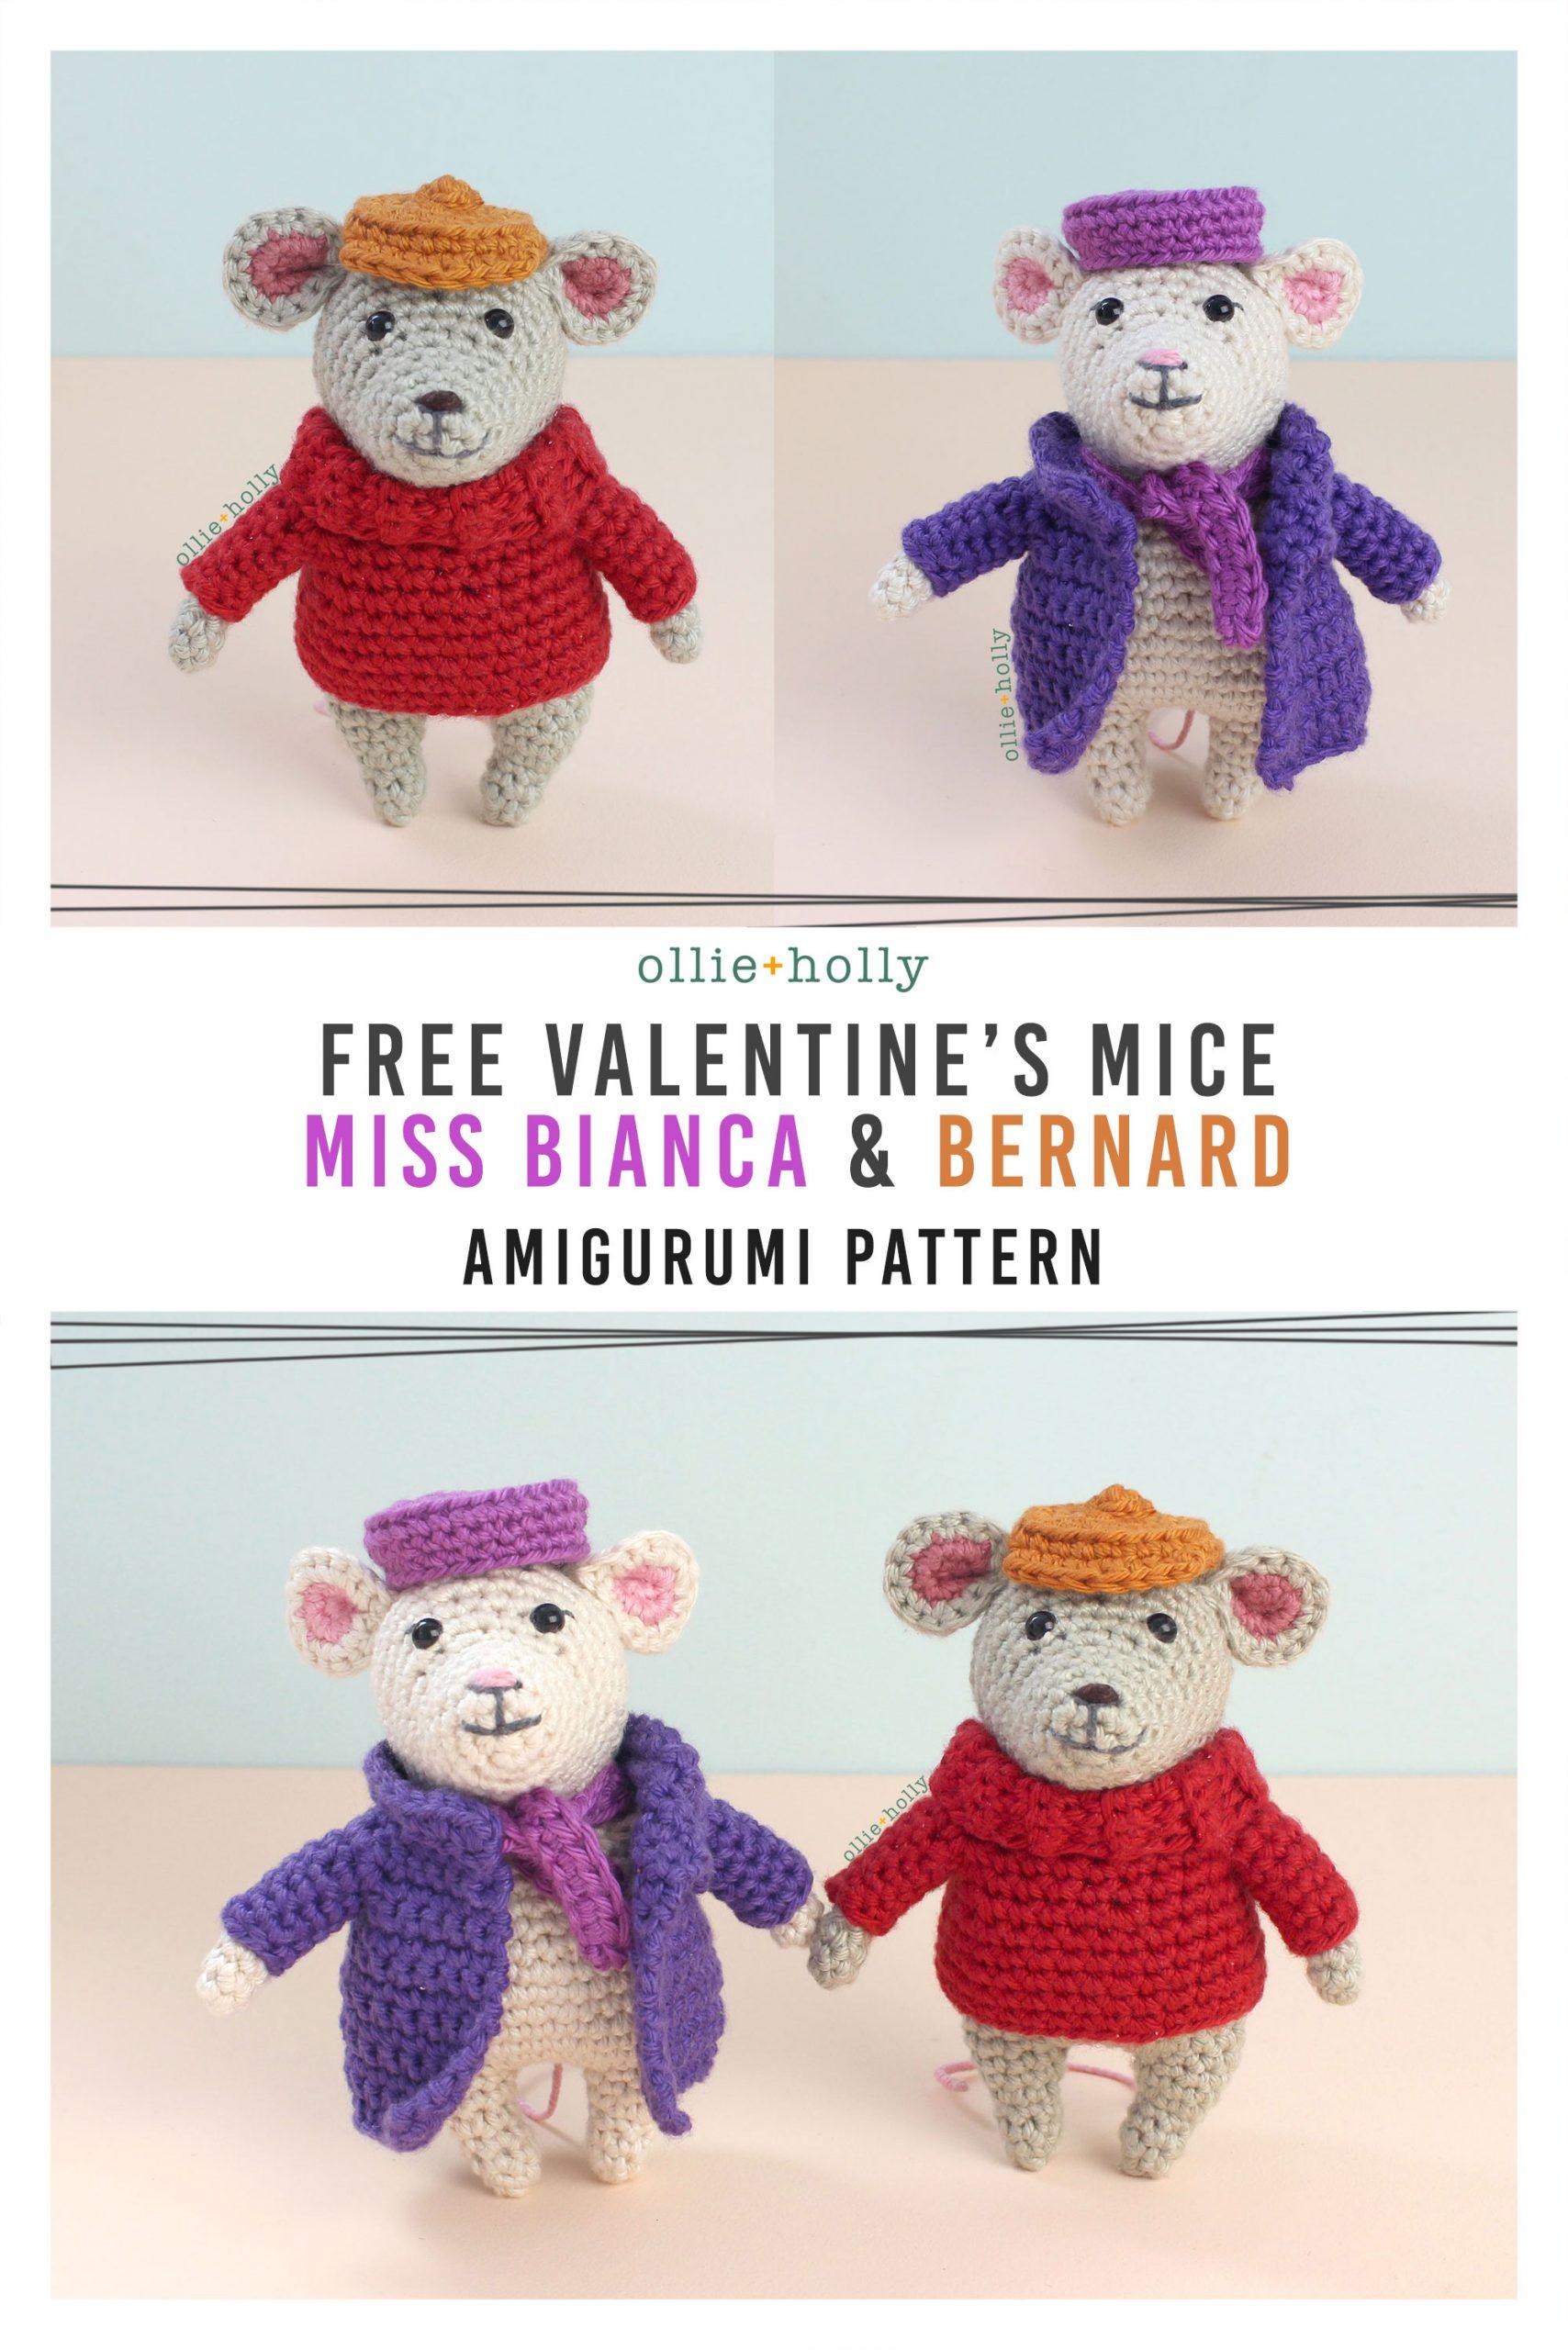 The Rescuers Miss Bianca & Bernard Mouse Free Amigurumi Crochet Pattern